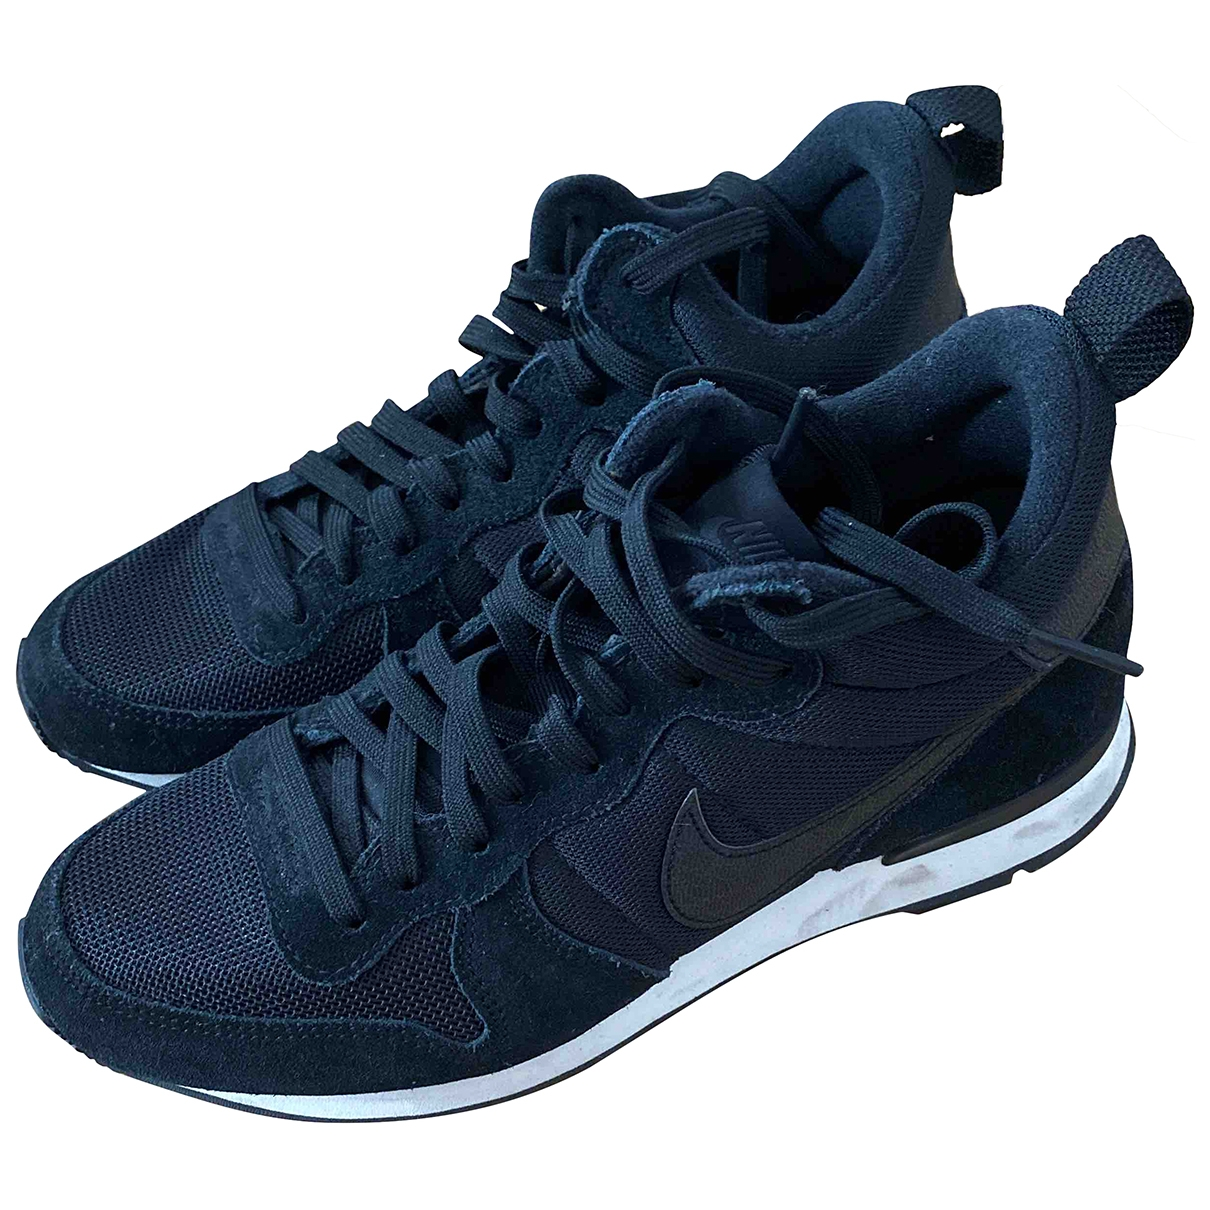 Nike - Baskets Internationalist pour femme en suede - noir